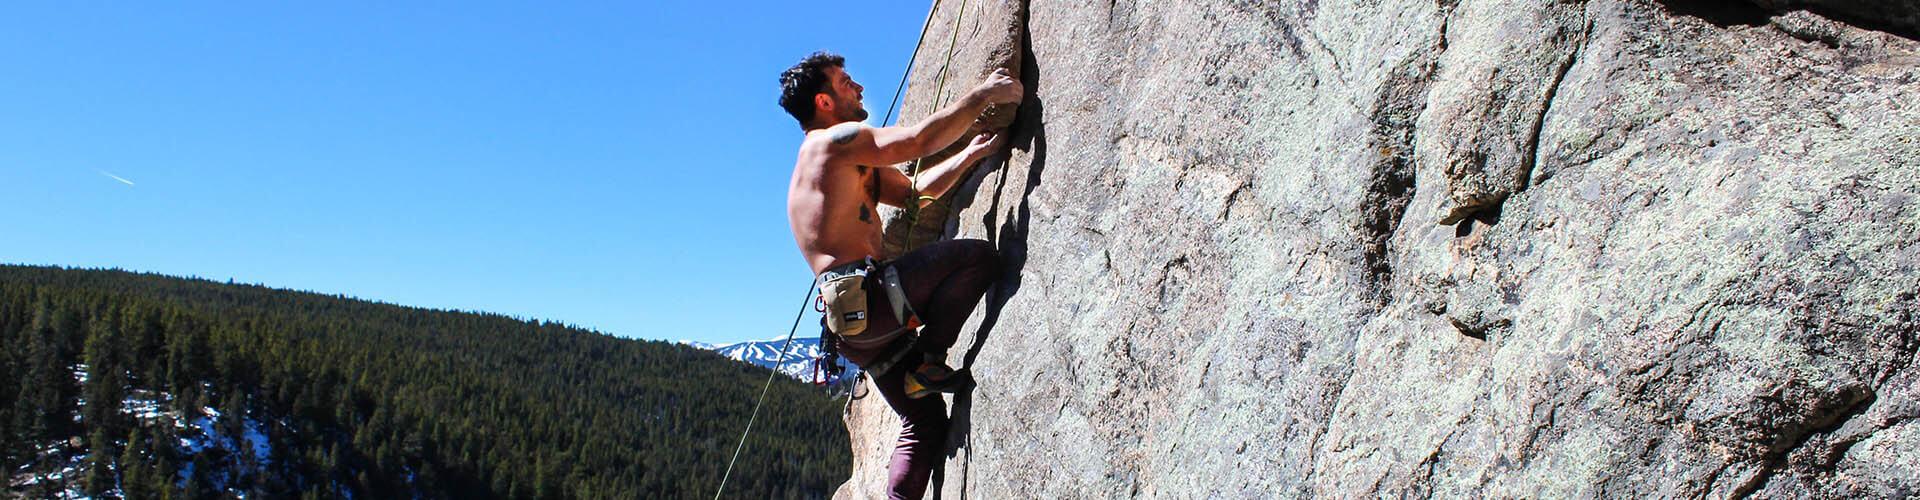 CBD Ratgeber | Sport und Fitness